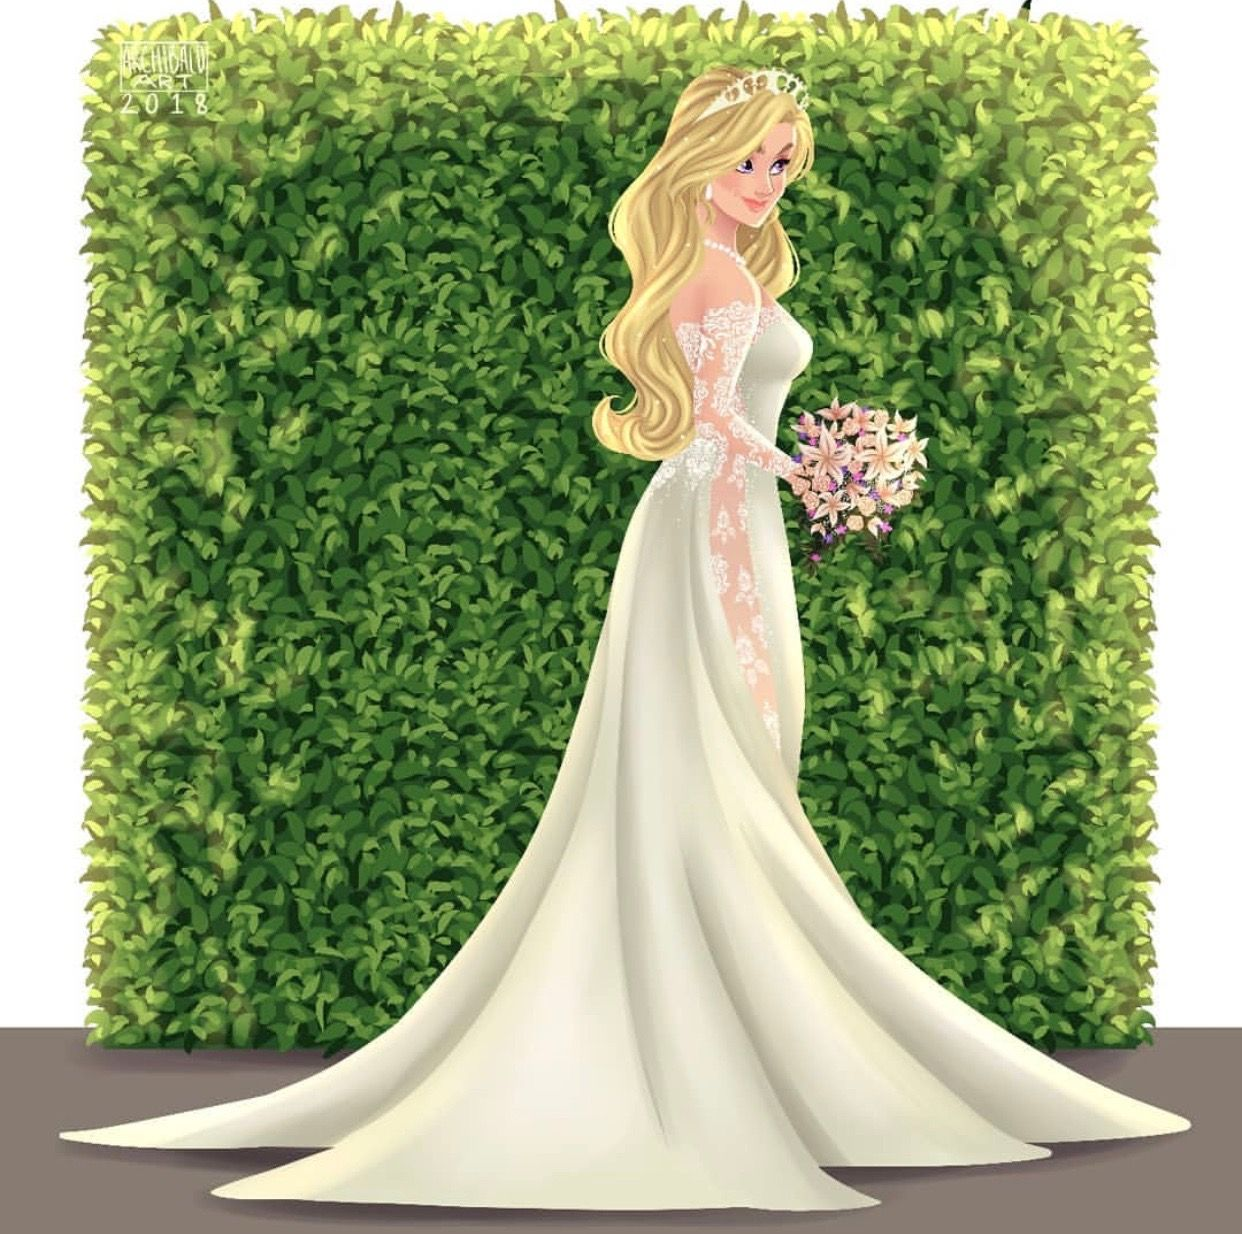 Greco archibald disney princesses x modern brides aurora